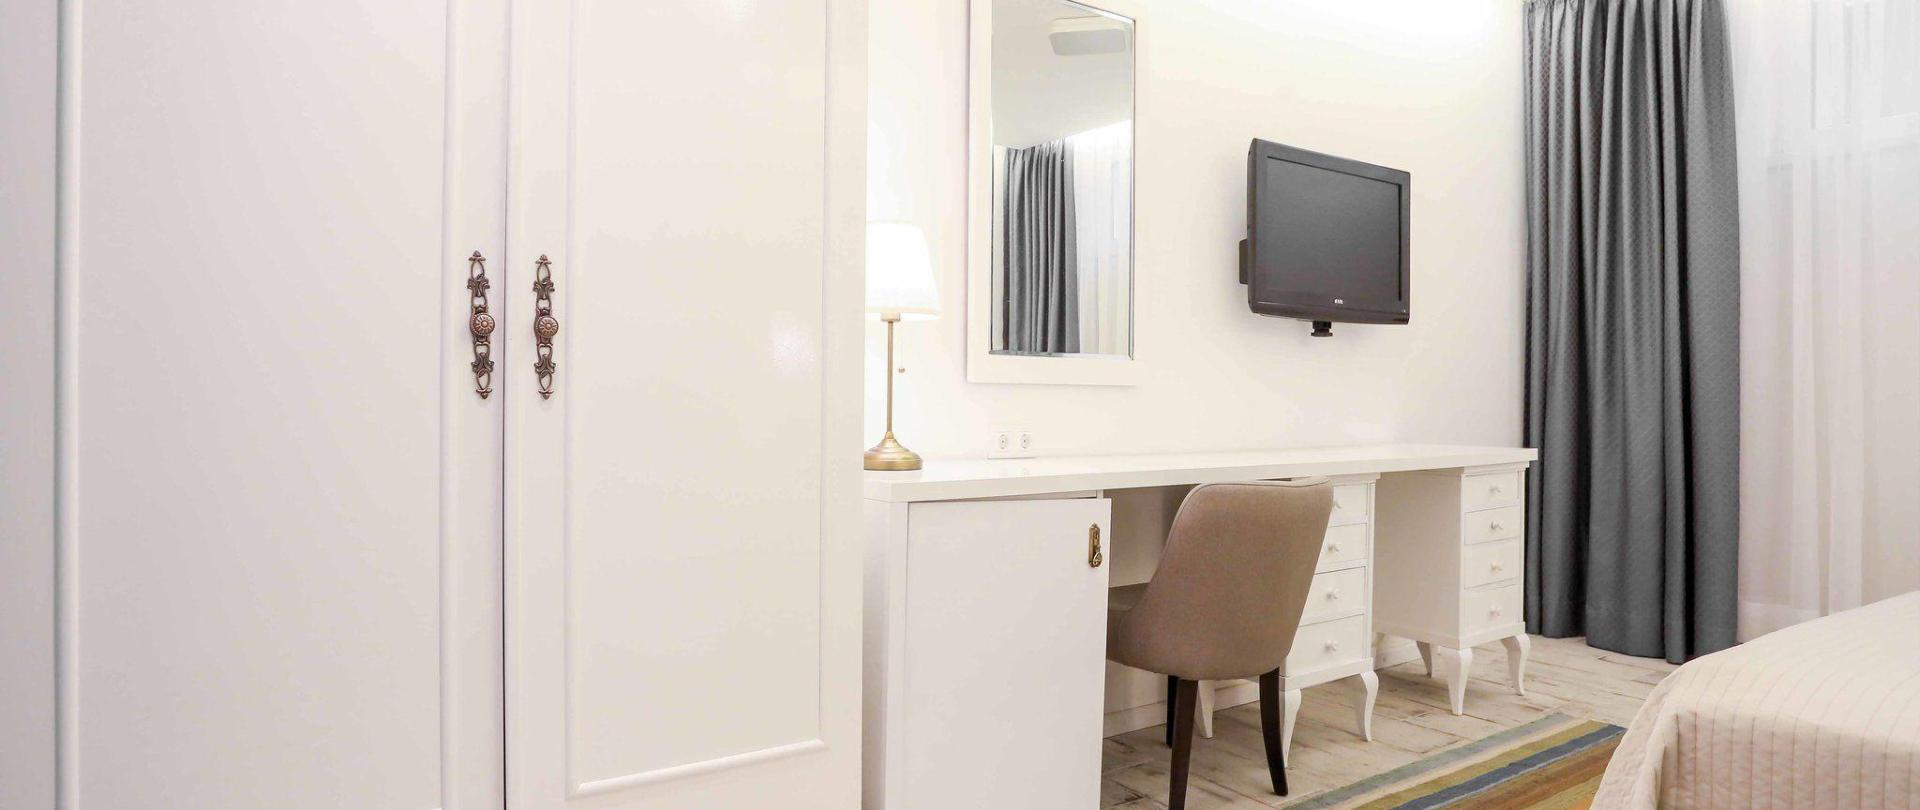 hotel-divan-by-dzenat-drekovic-29-08-2016-2.jpg